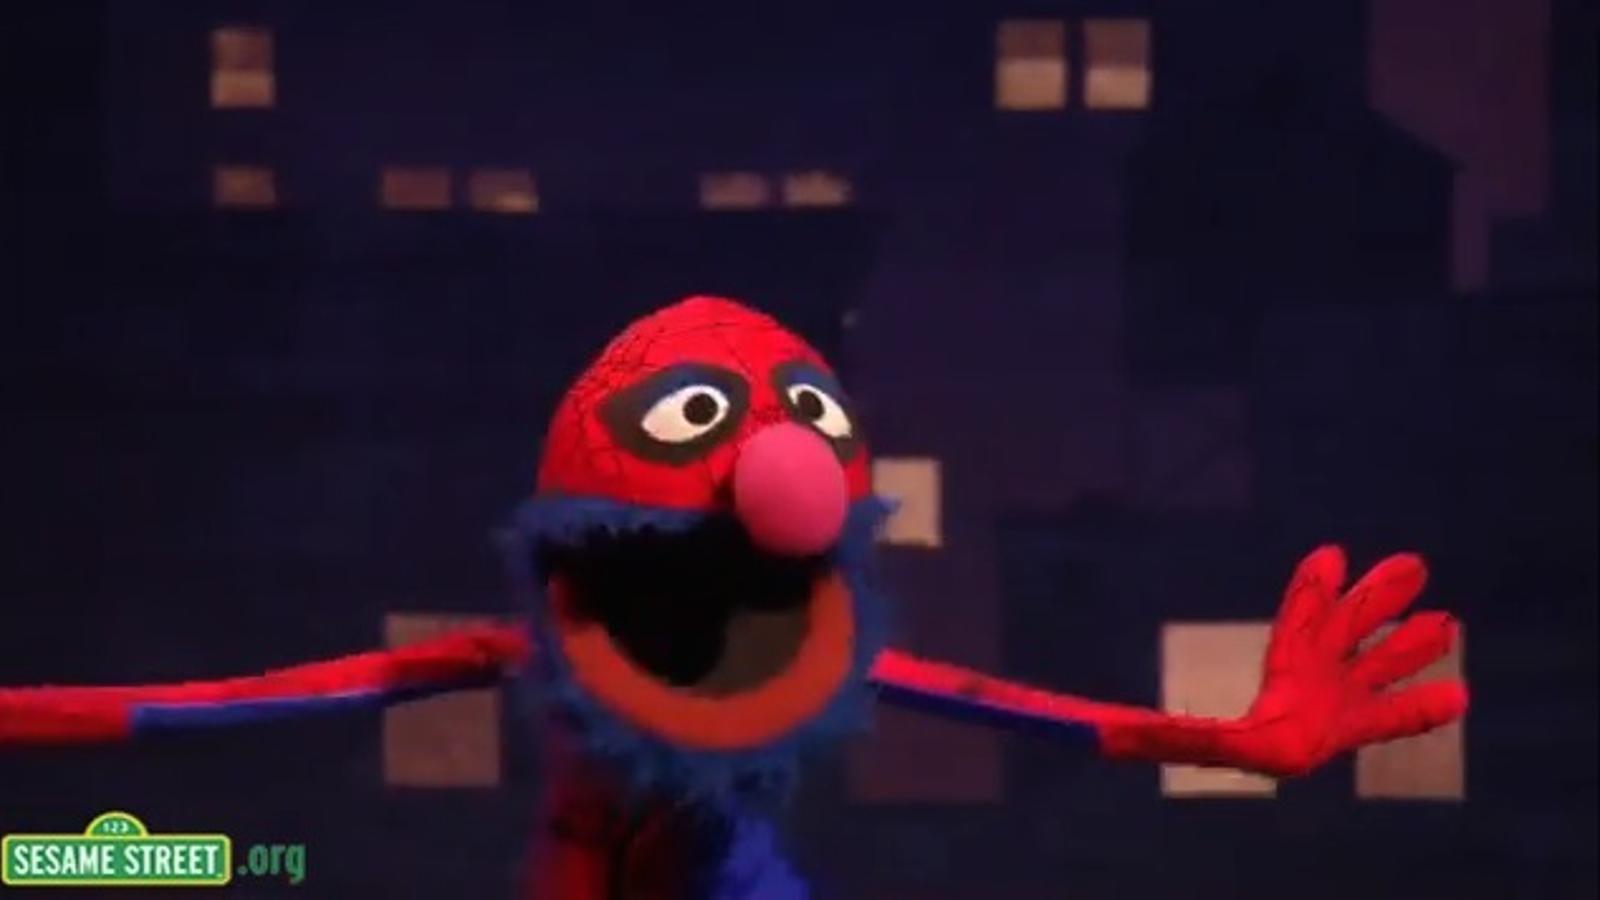 La paròdia de Sesame Street del musical 'Spider-Man'